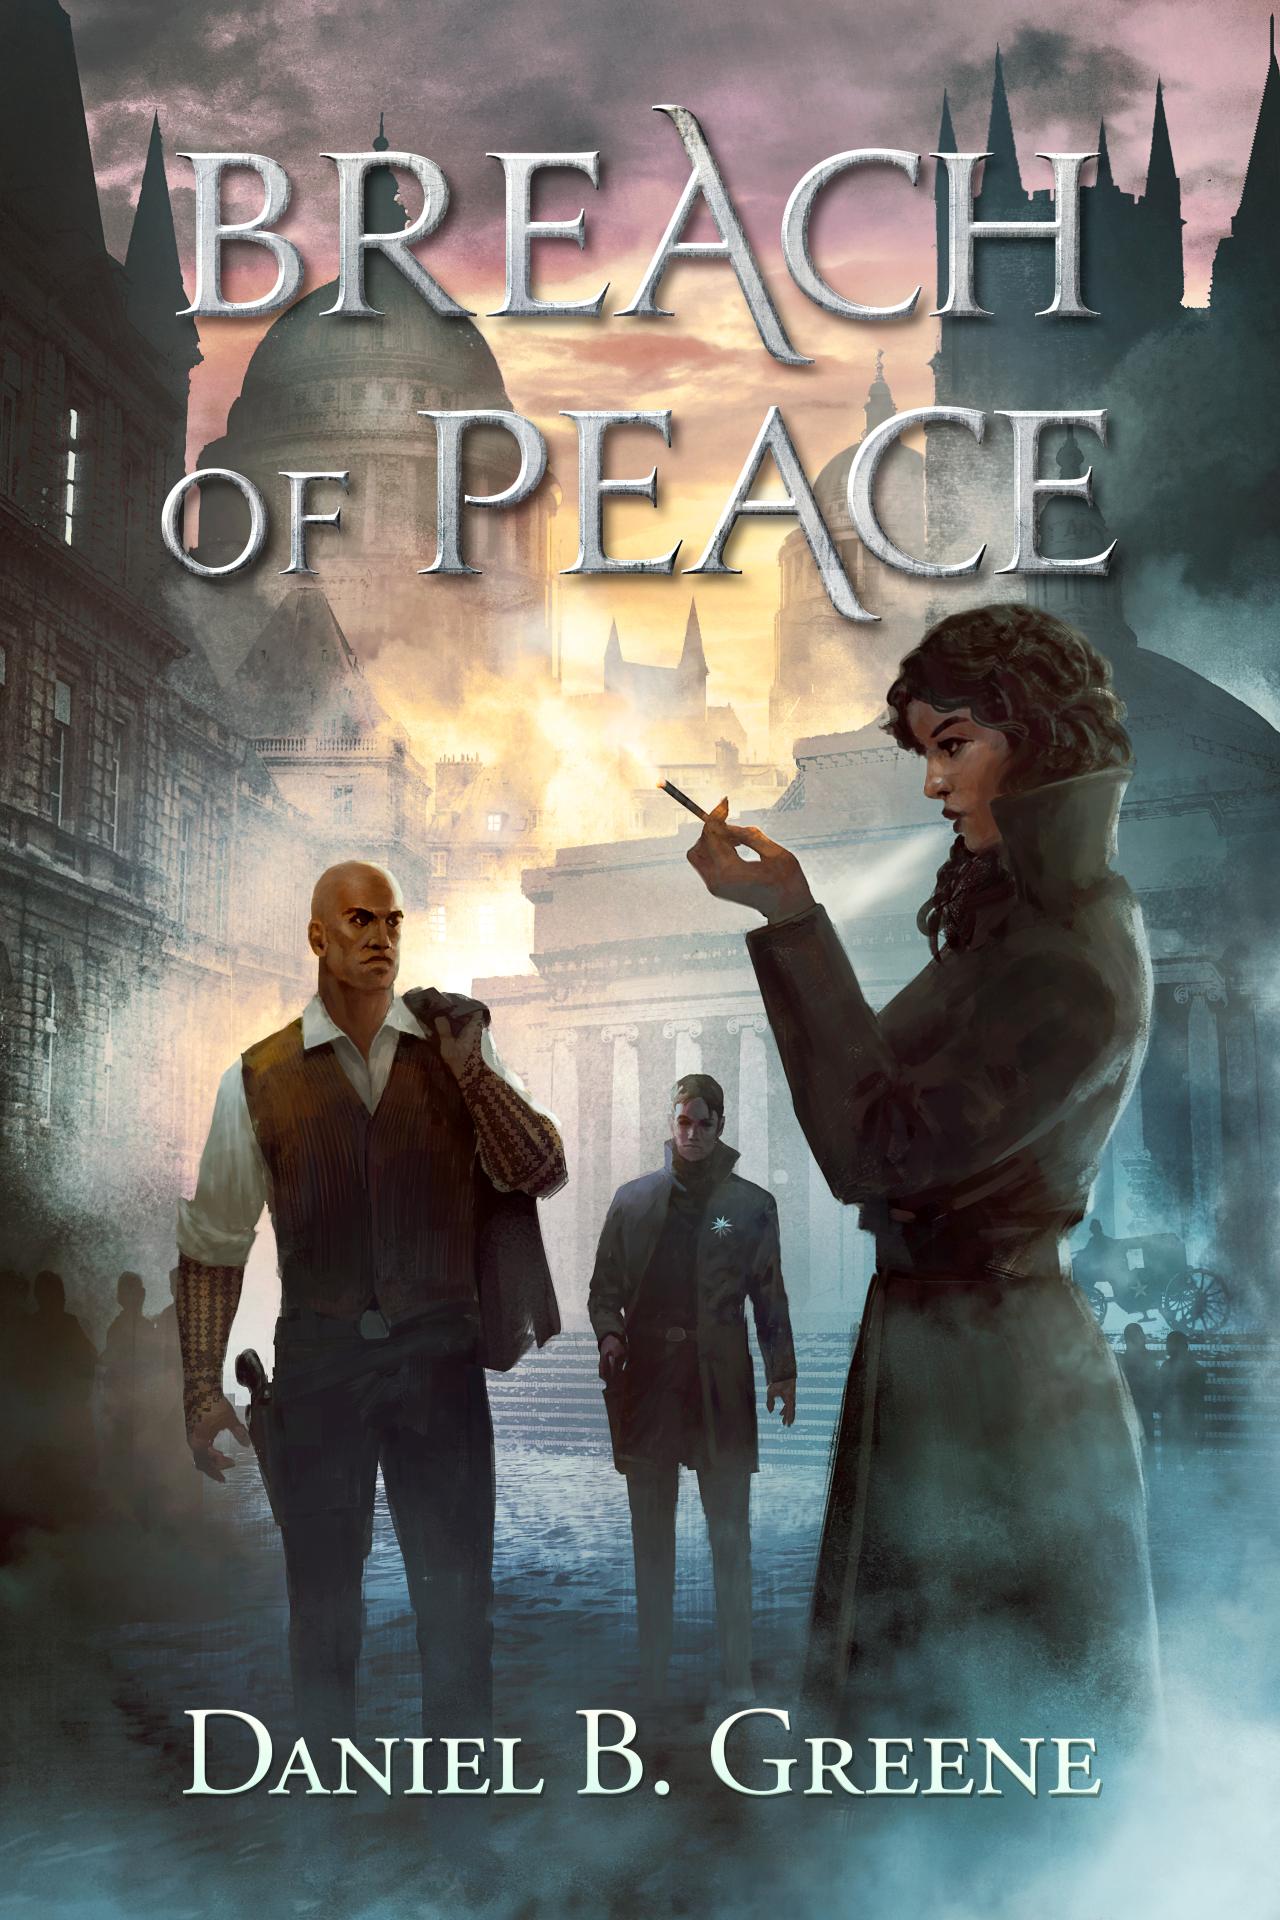 Breach of Peace by Daniel B. Greene